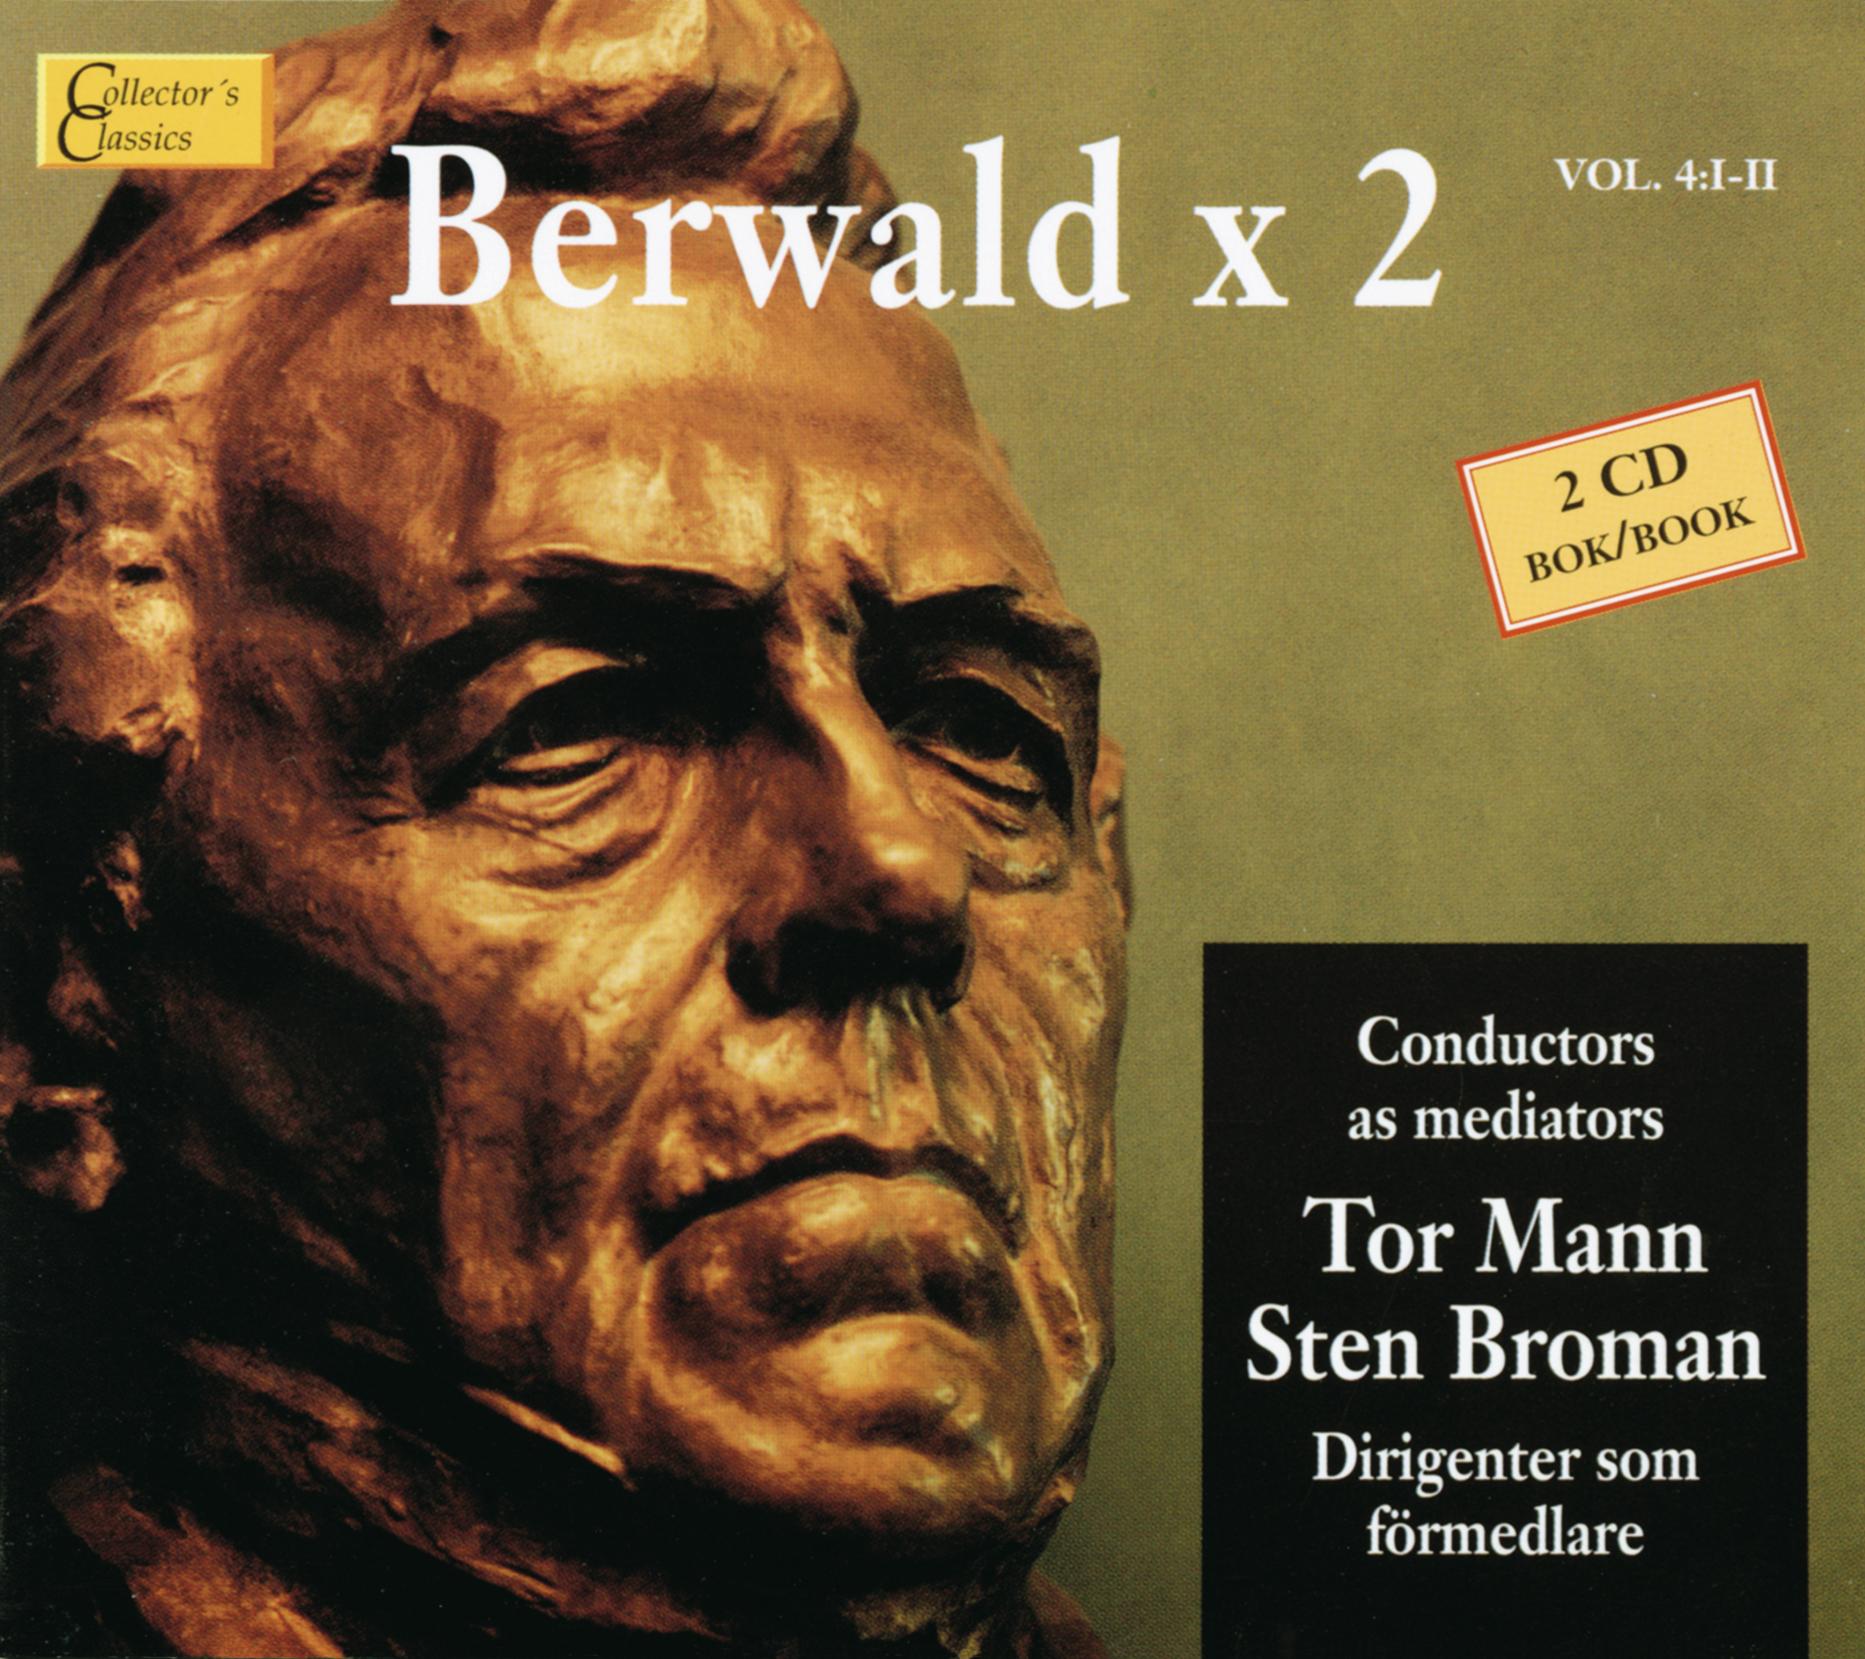 Berwald x 2 vol. 4